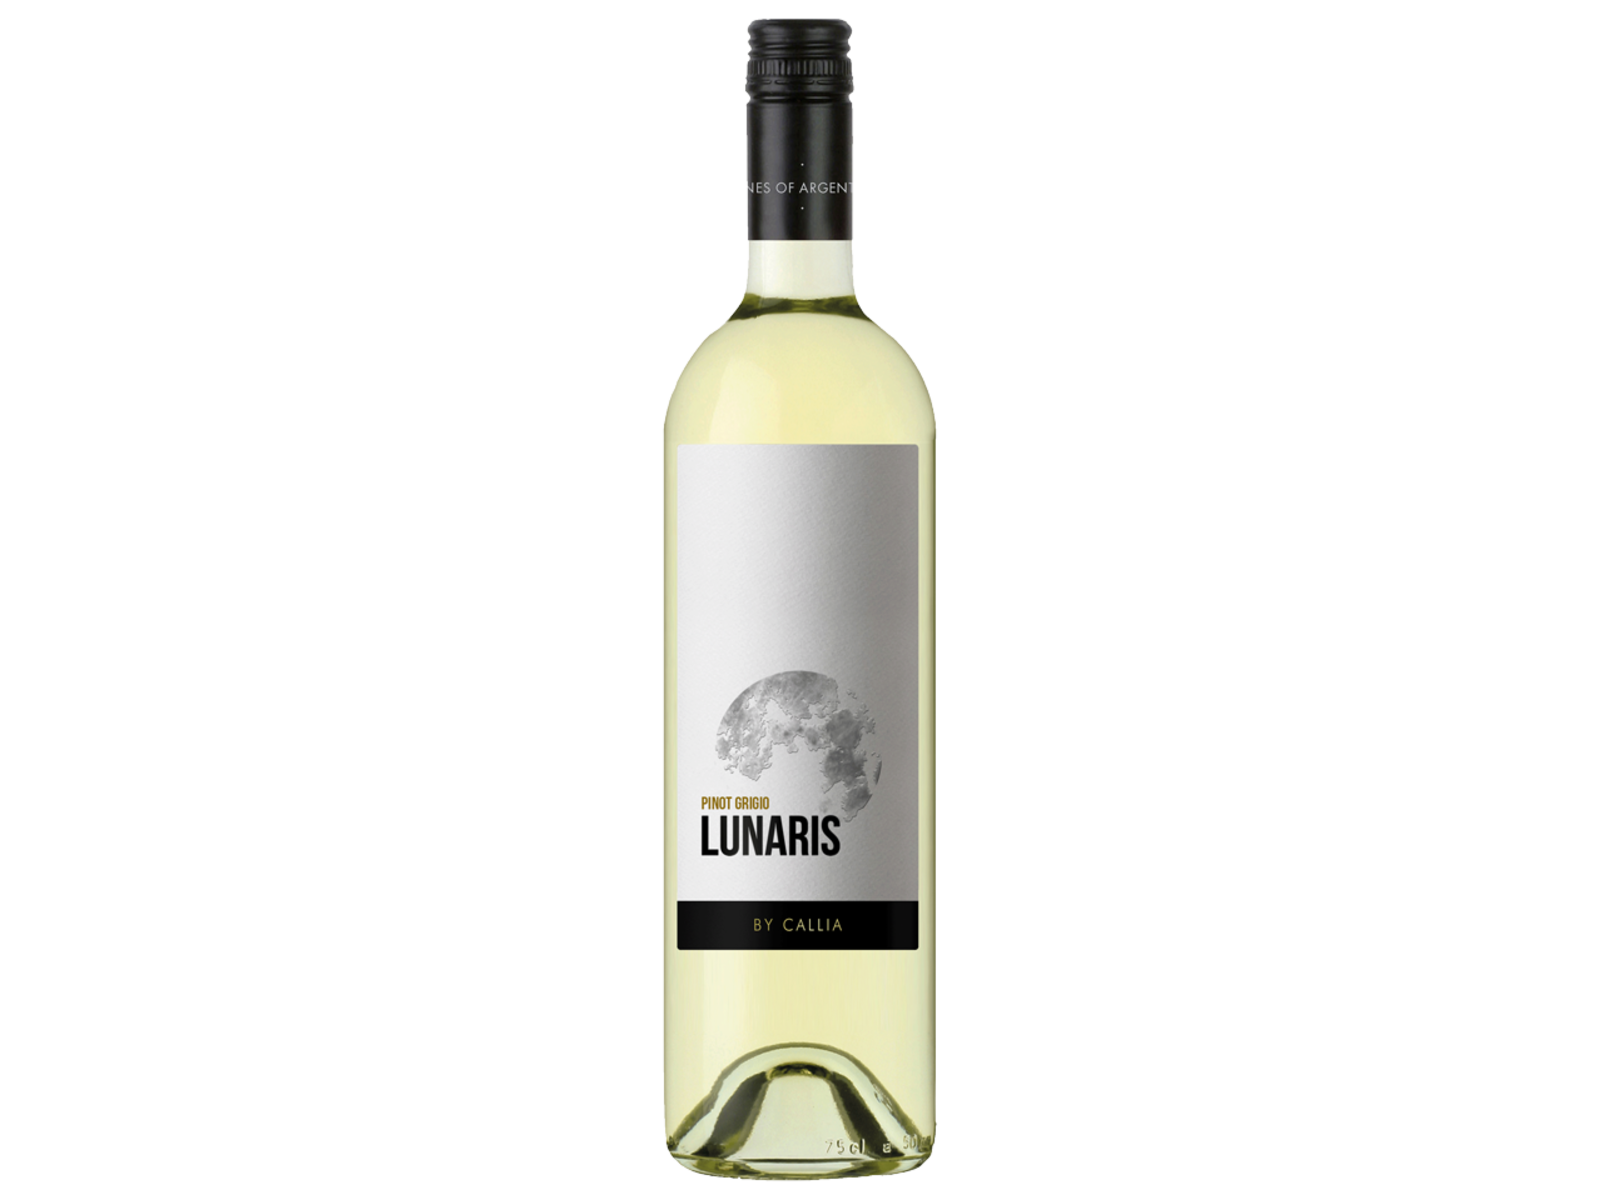 Bodegas Callia Lunaris / Pinot Grigio